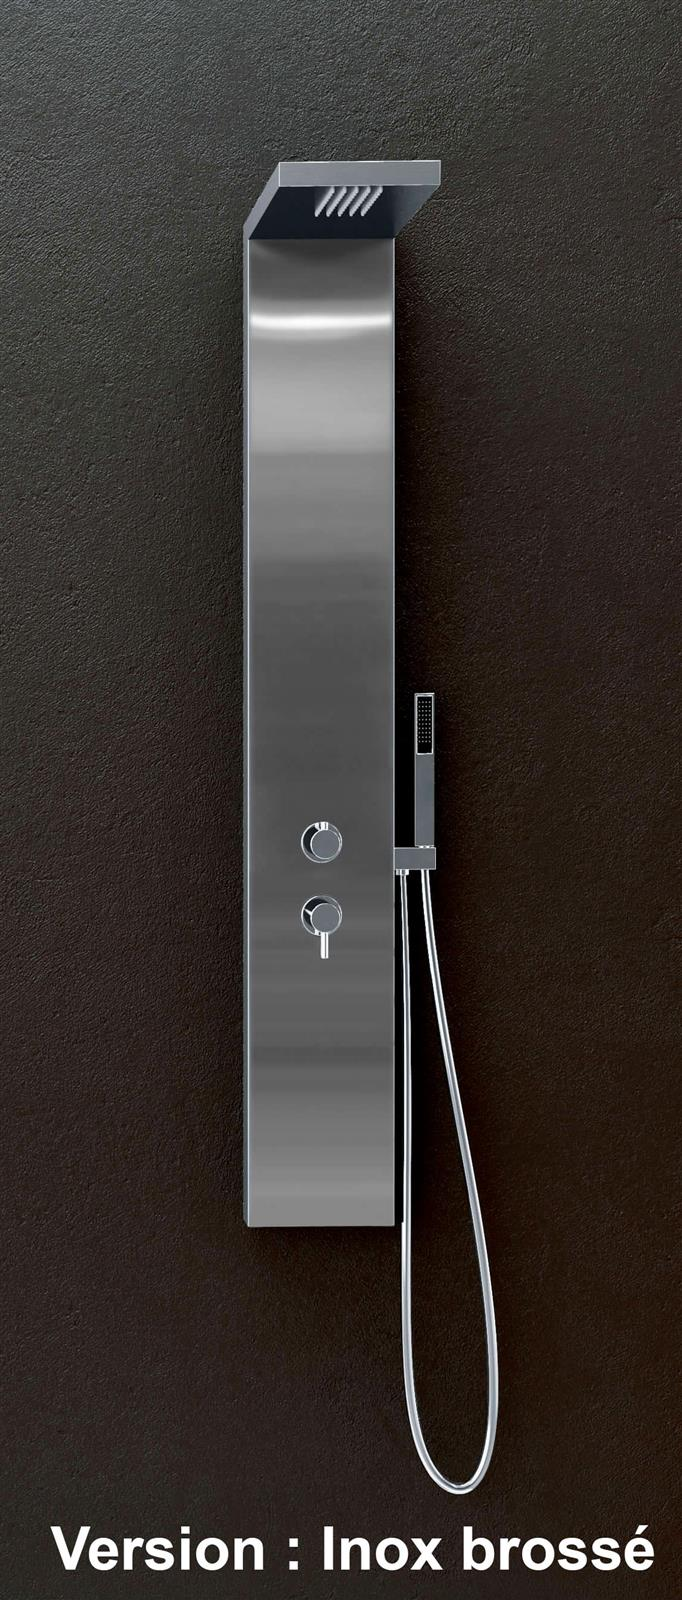 colonne de douche aquastyle kinedo. Black Bedroom Furniture Sets. Home Design Ideas